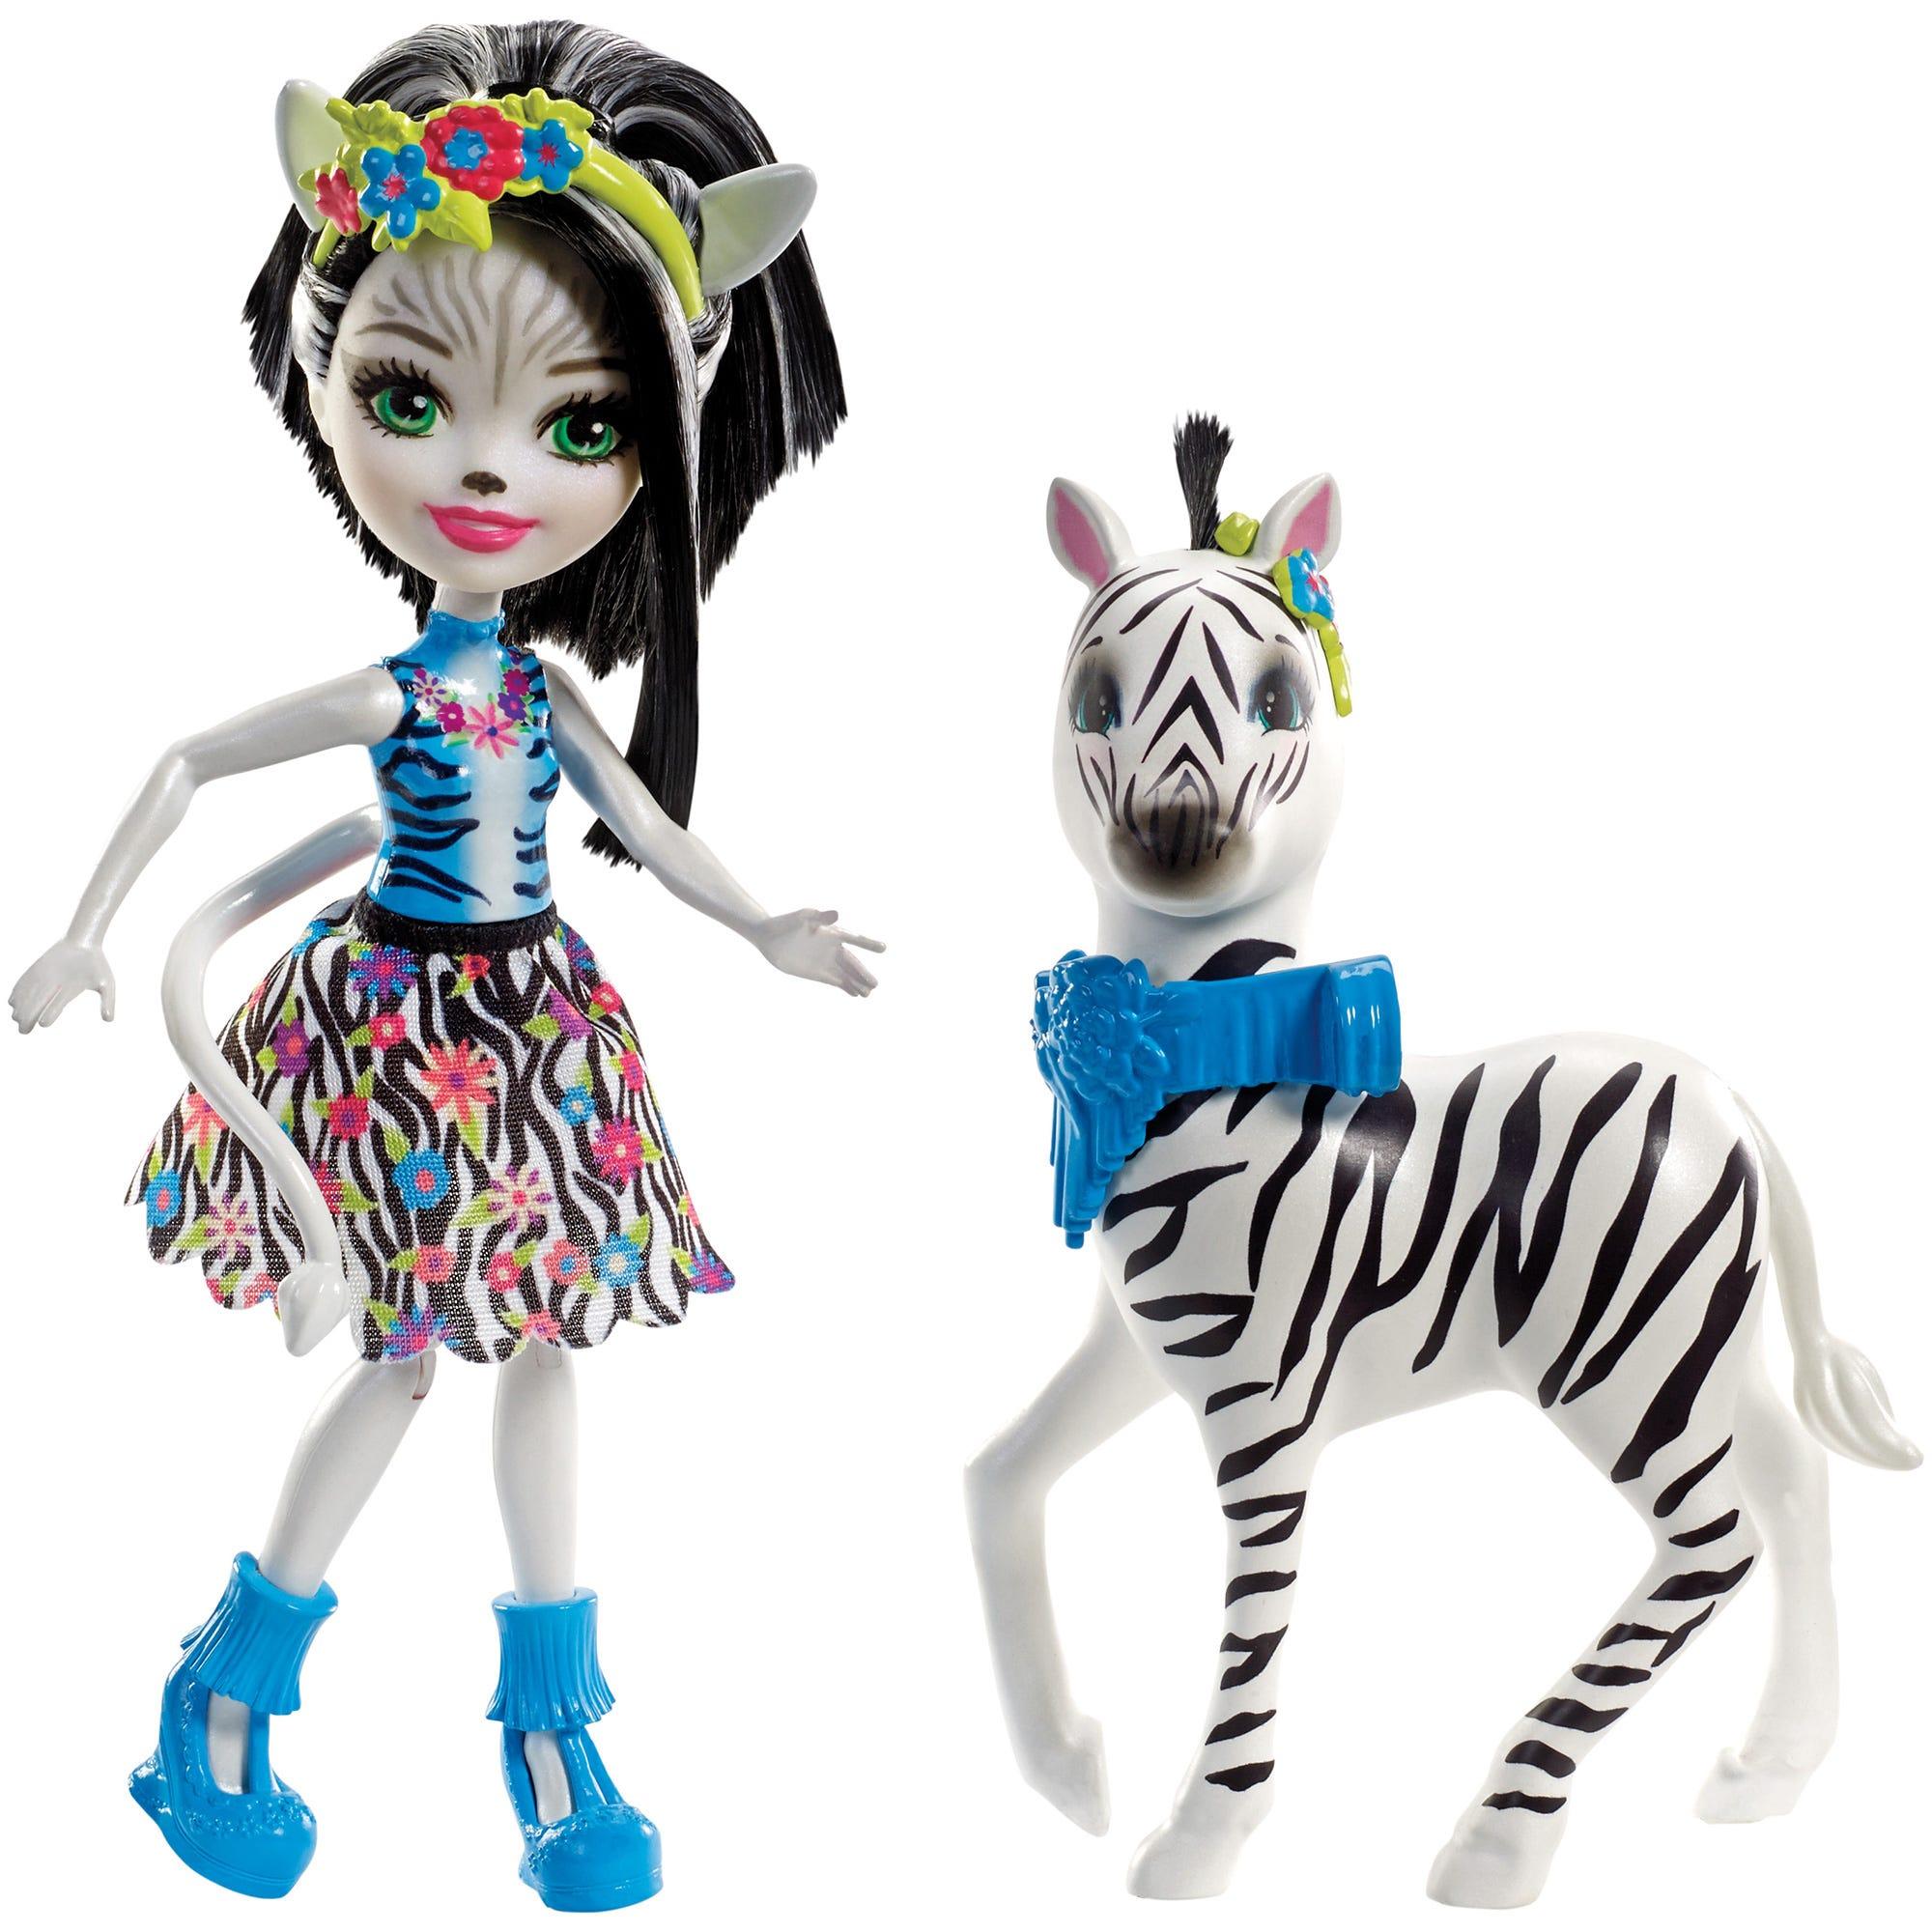 Enchantimals Zelena Zebra Doll